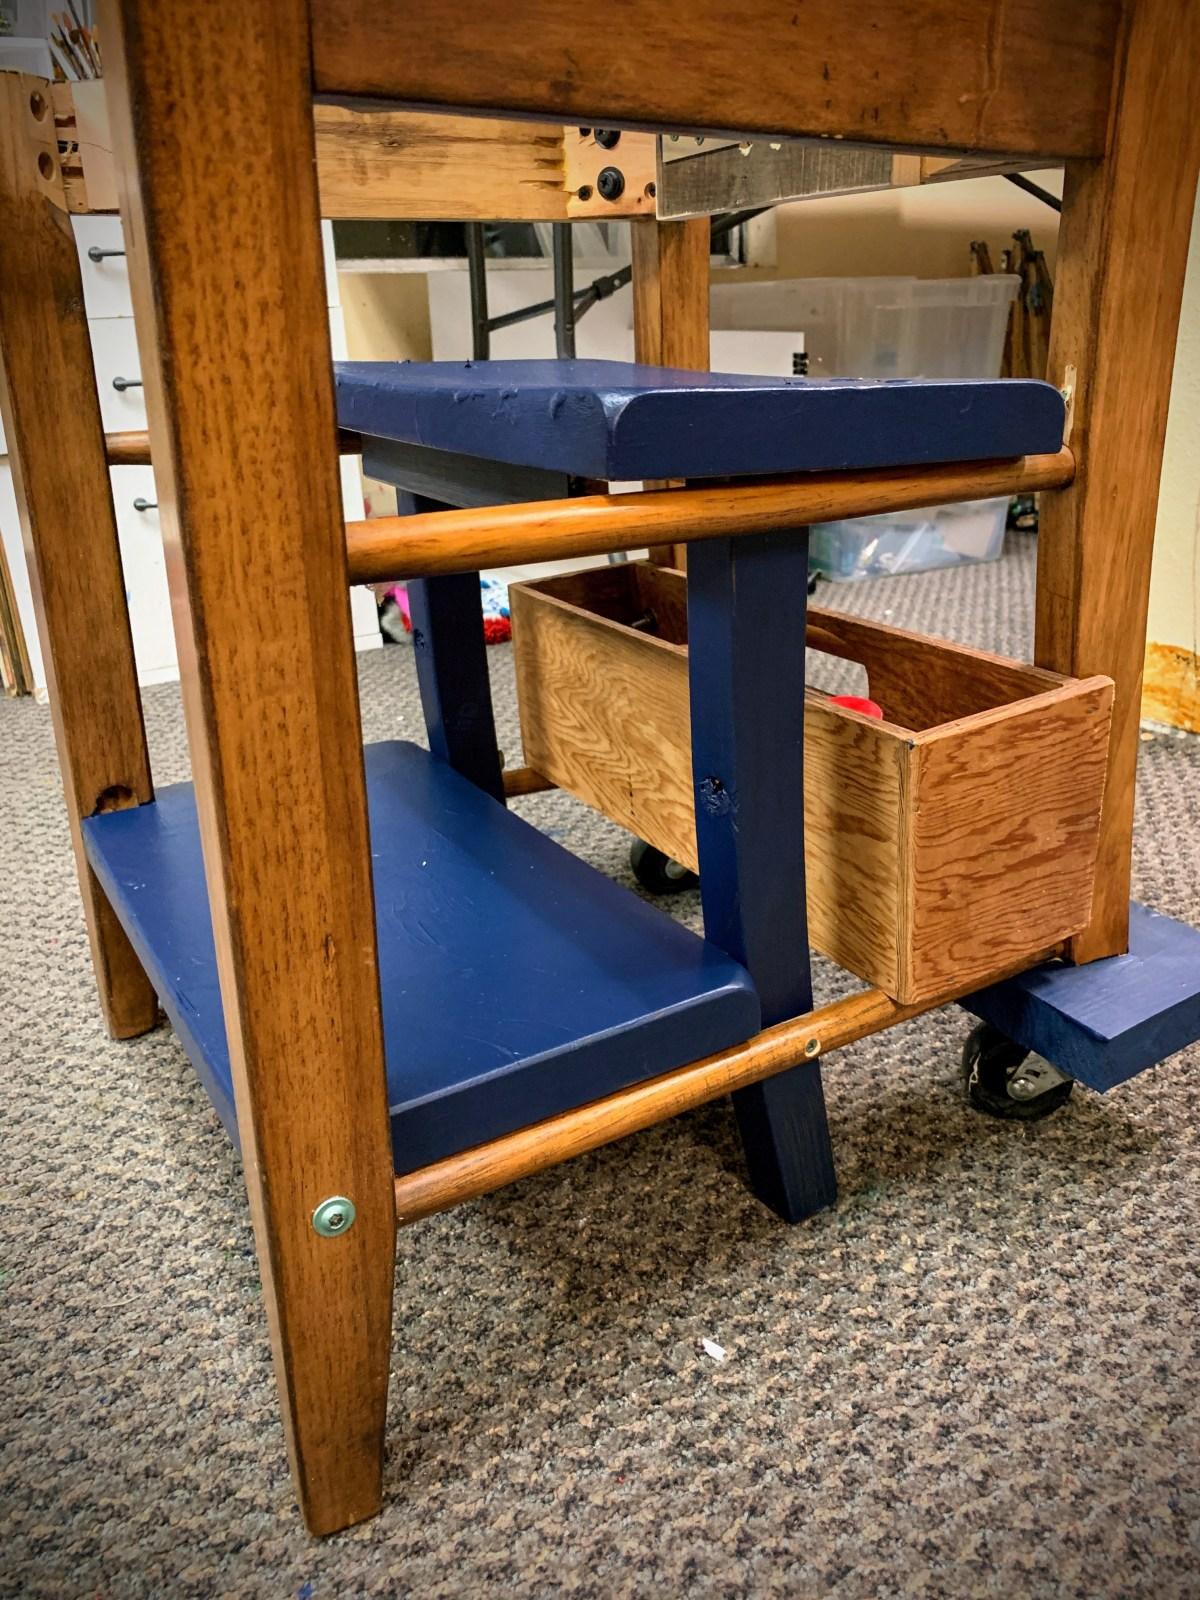 Rebuilding Project: Chair/Stepstool/ChessTable Combo | The Loaded Brush | www.loadedbrushpdx.com